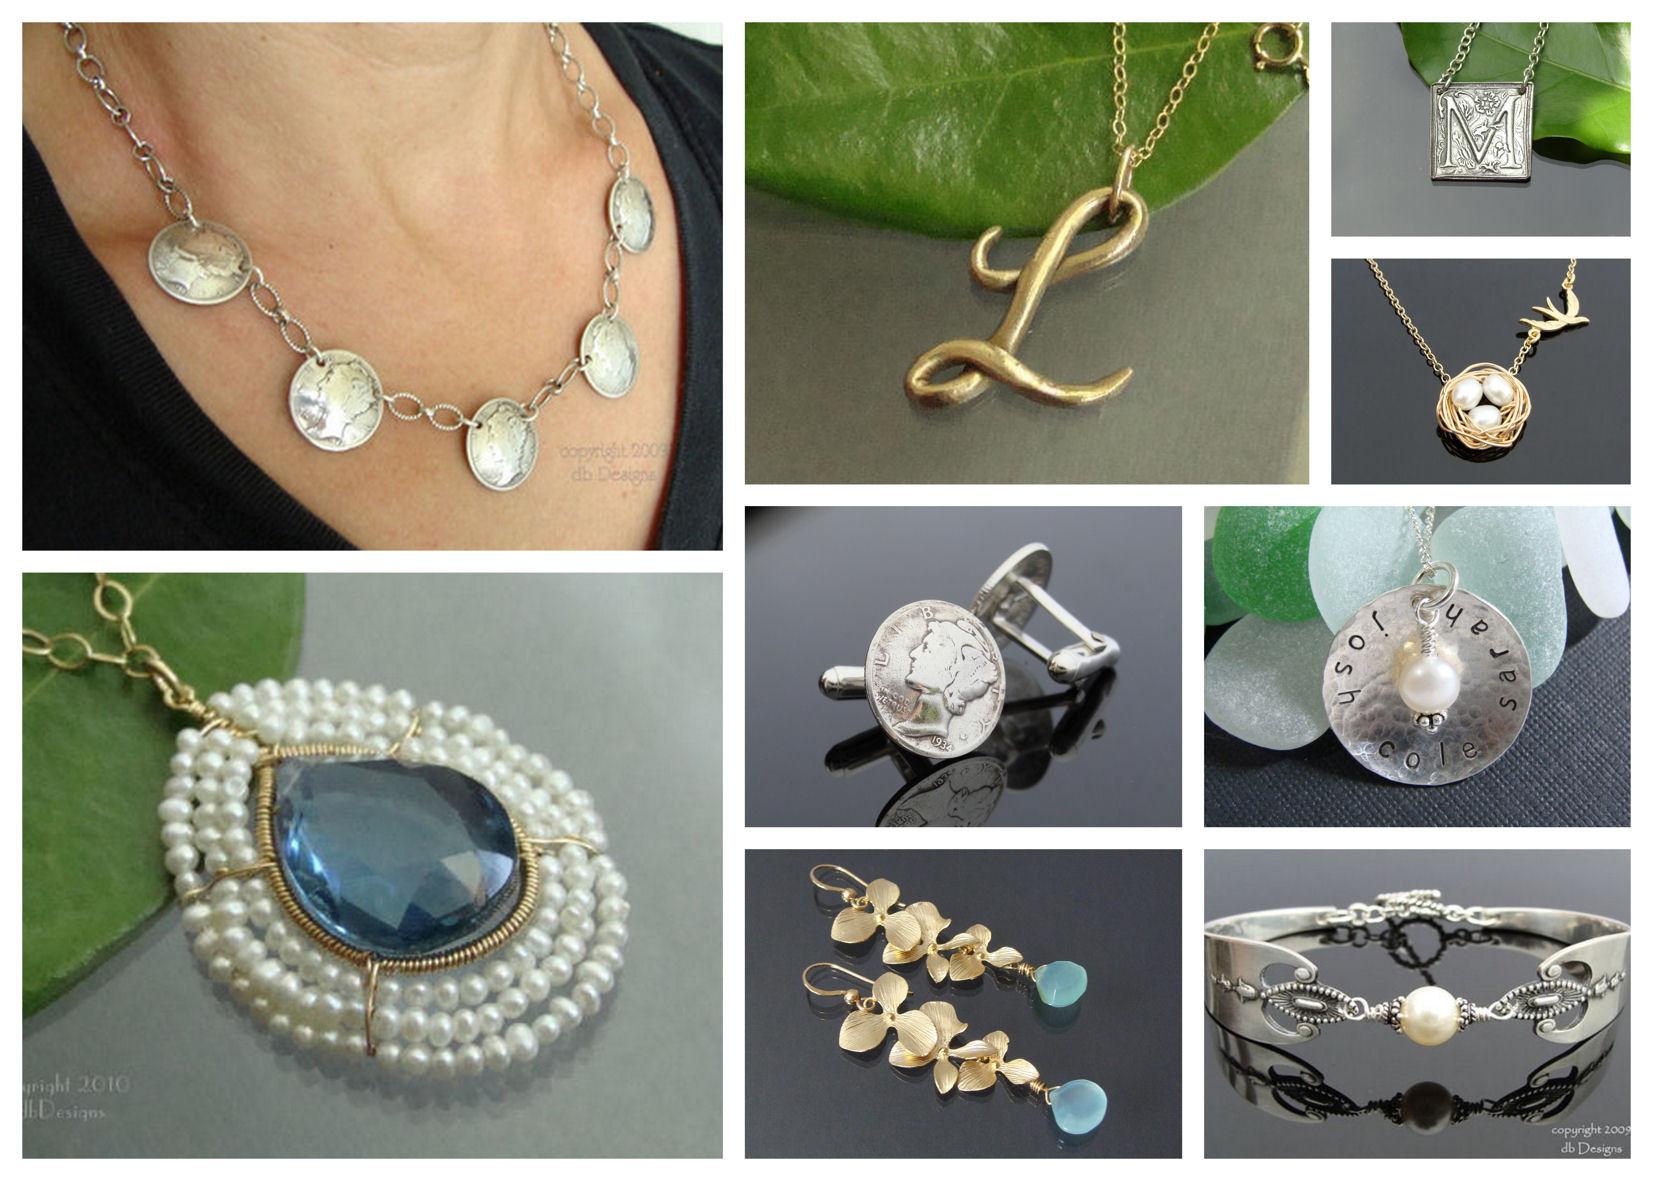 RESERVED FOR BARBARA-bridesmaid jewelry, bridal party jewelry, bridesmaid earrings, bridal jewelry, wedding jewelry